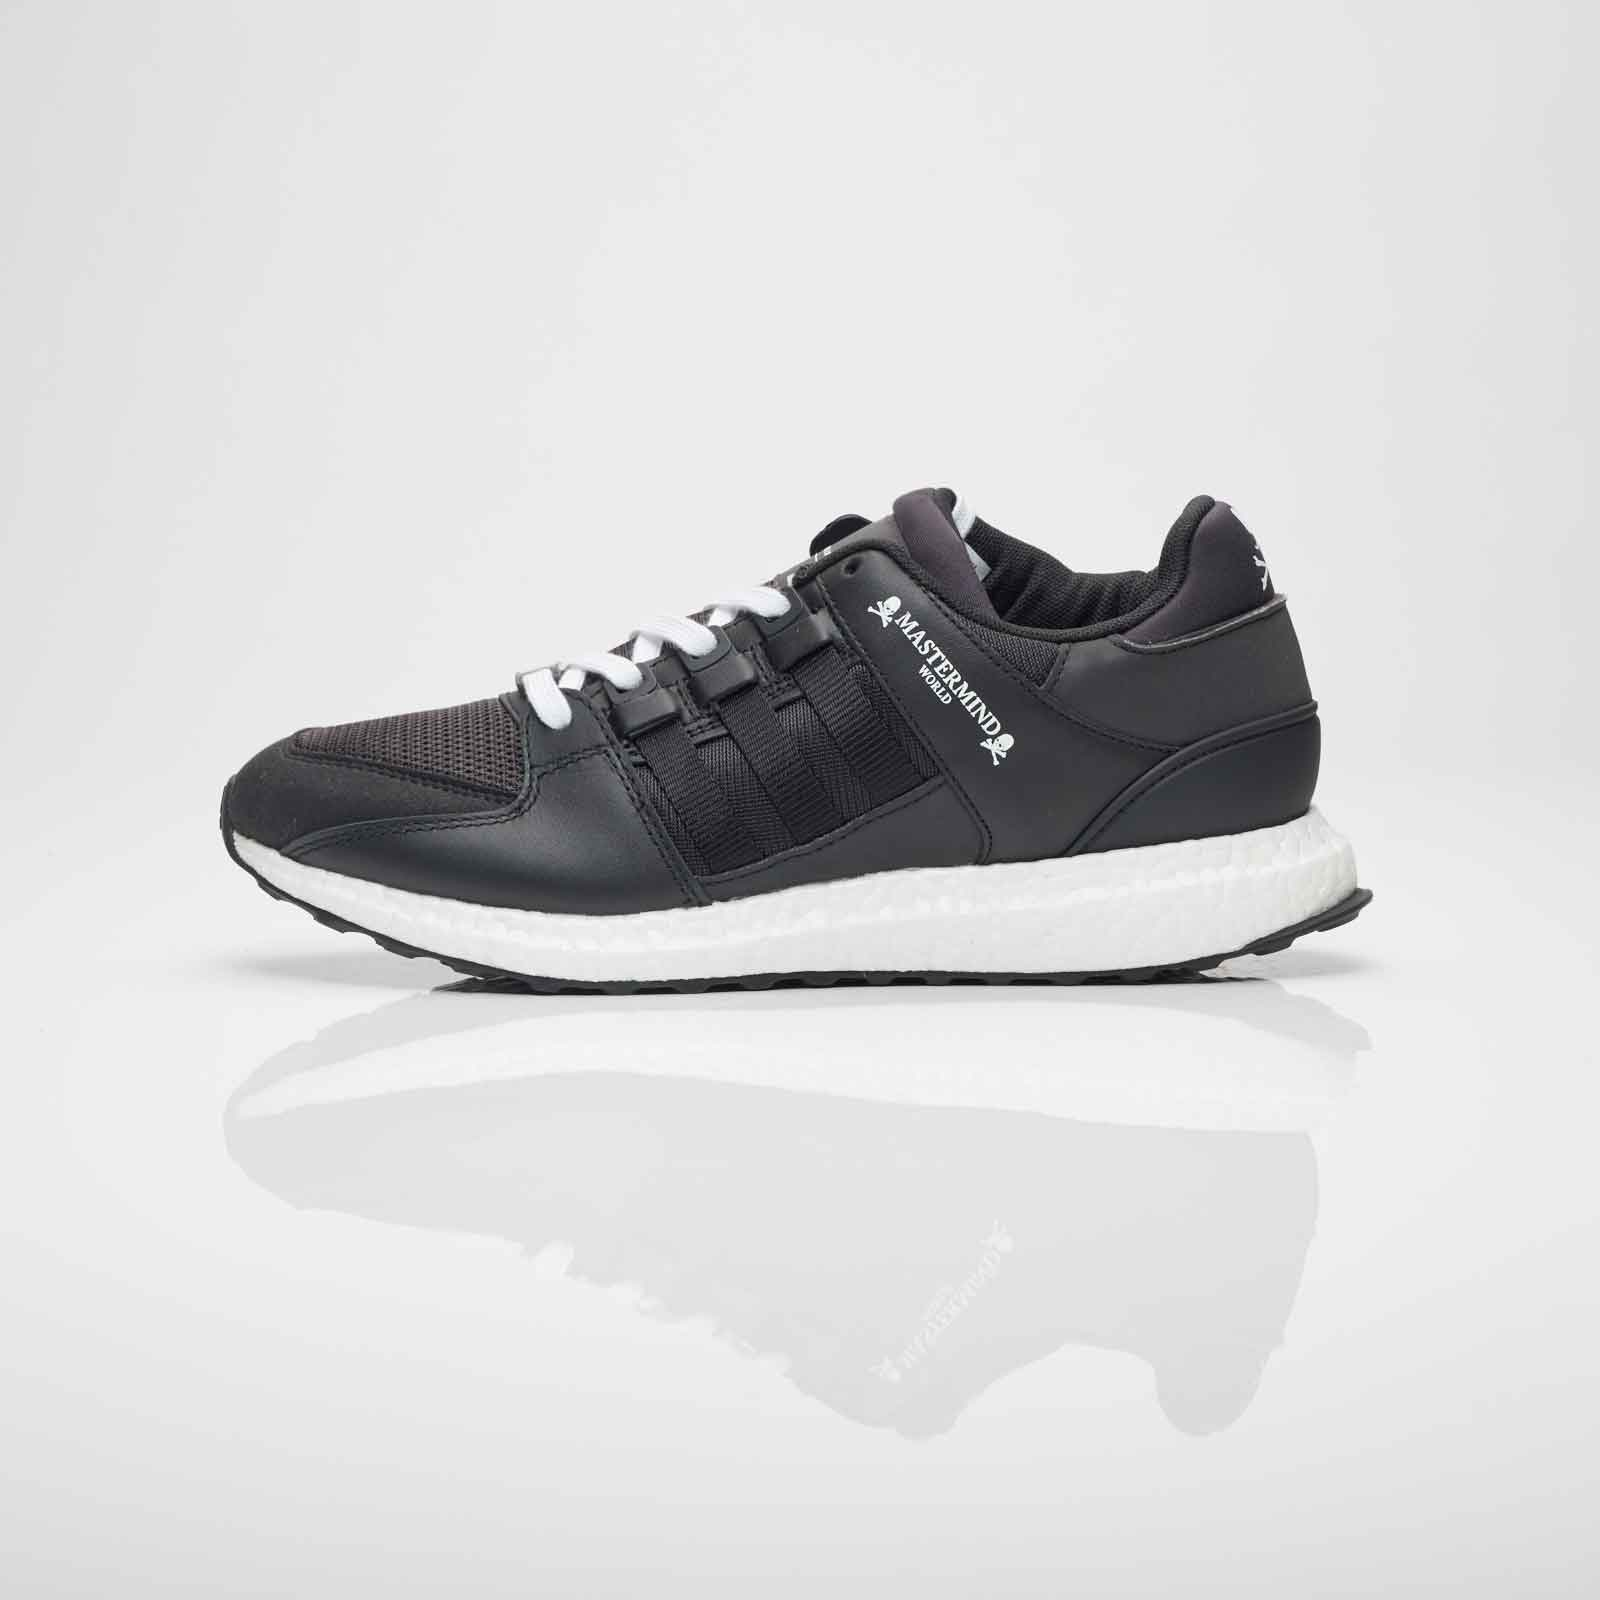 9b49f0b0c adidas EQT Support Ultra by Mastermind World - Cq1826 - Sneakersnstuff